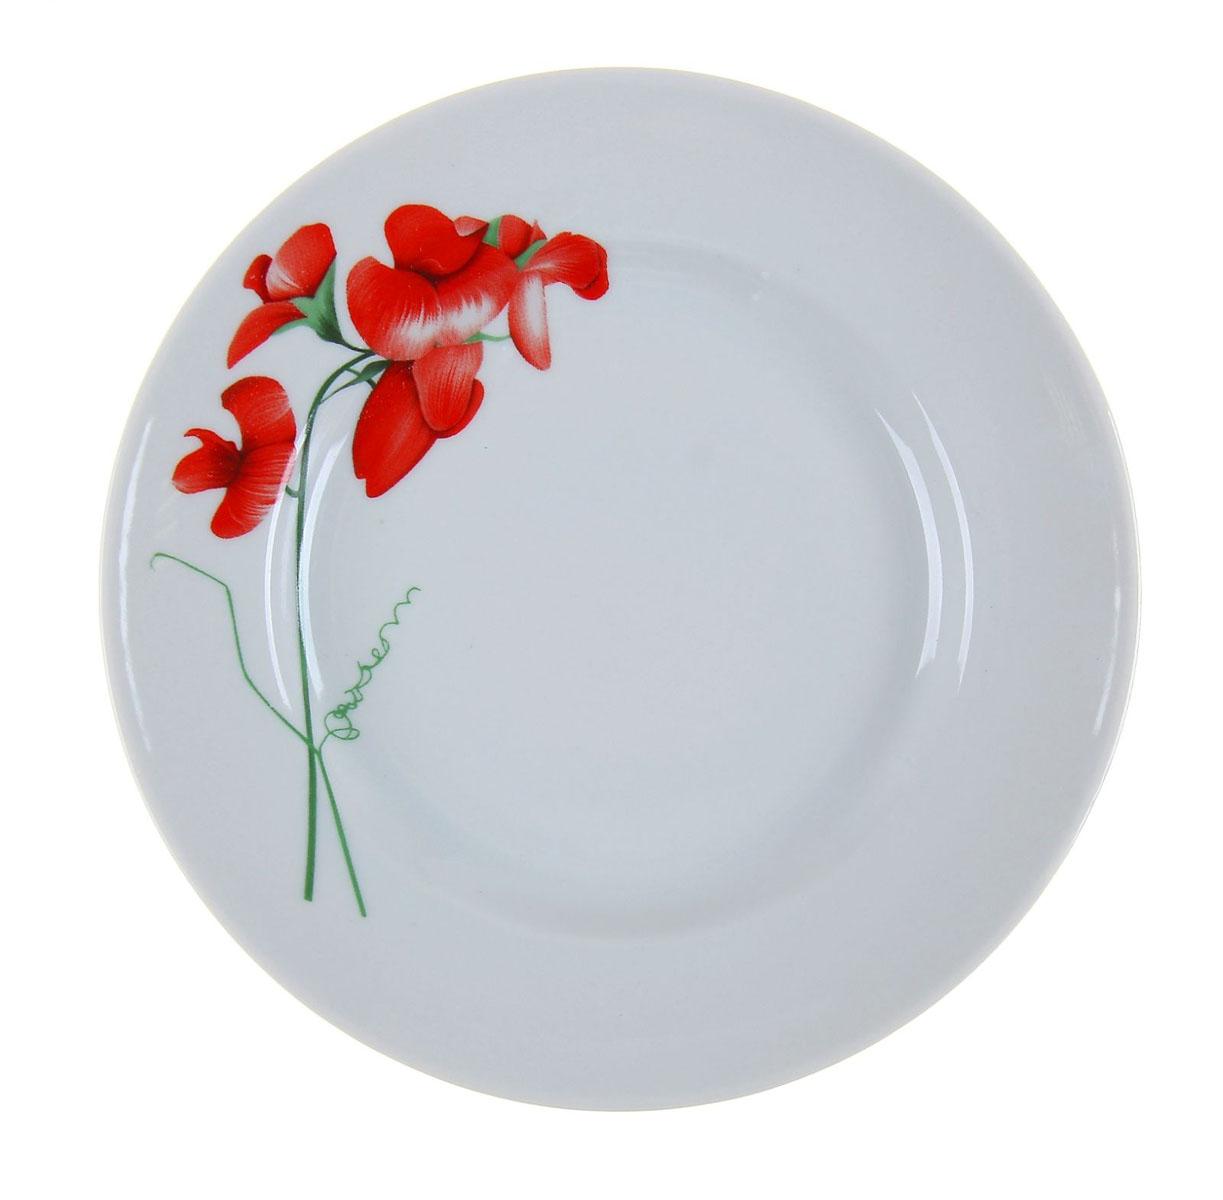 Тарелка мелкая Идиллия. Рубин, диаметр 20 см тарелка идиллия космея диаметр 24 см